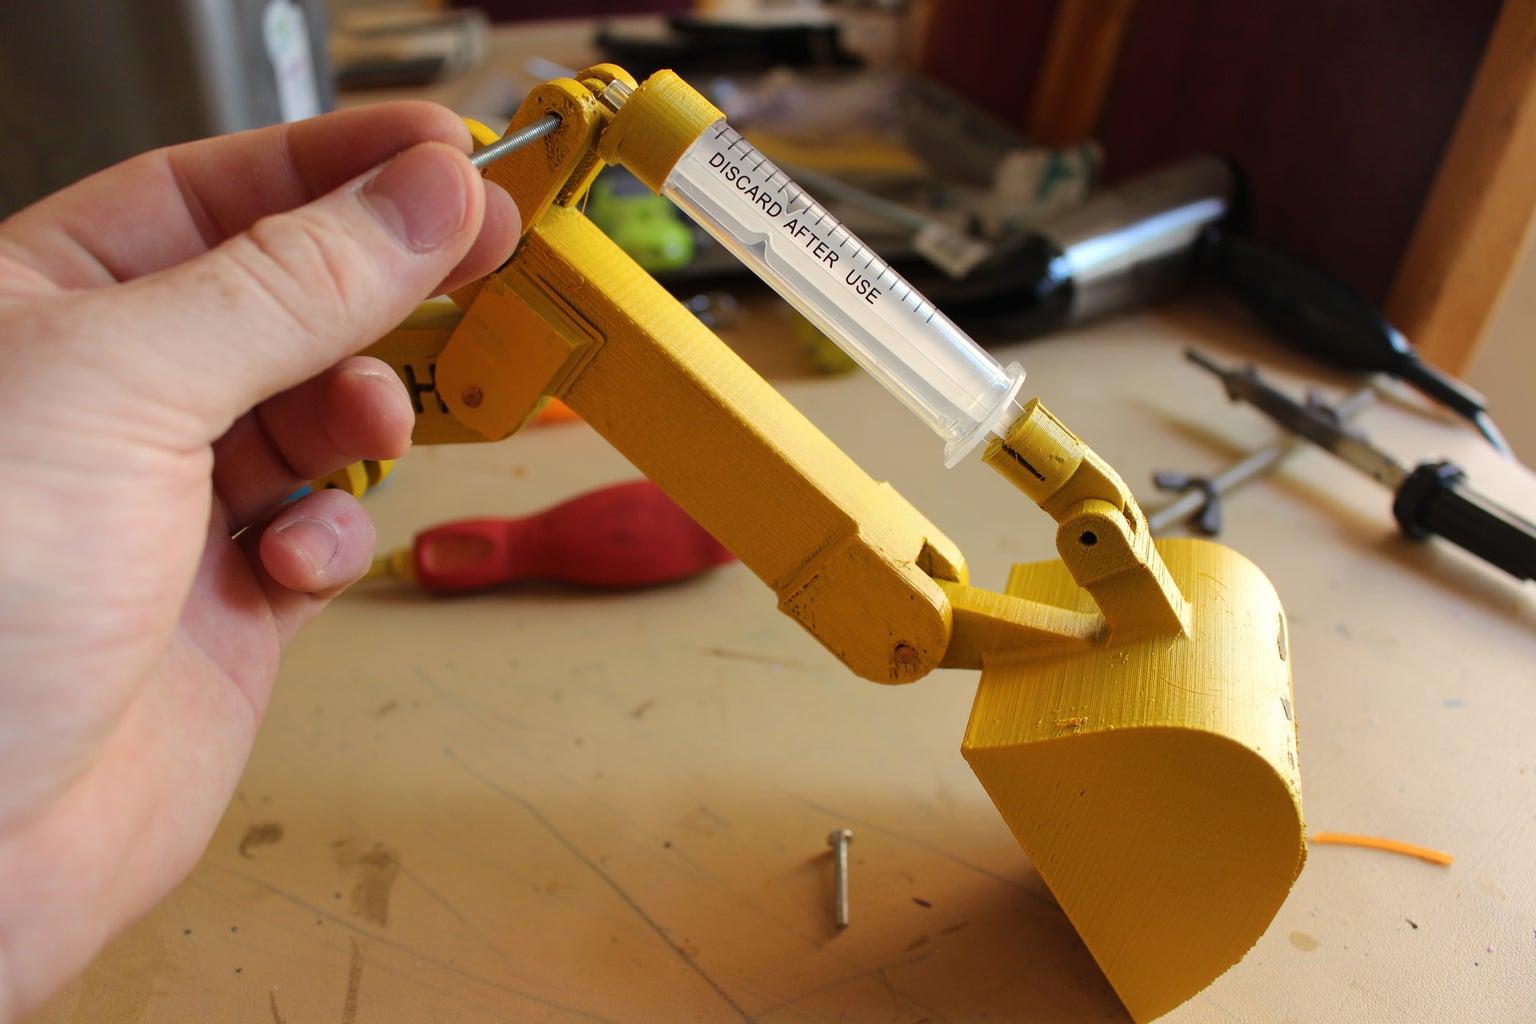 Arming the Excavator